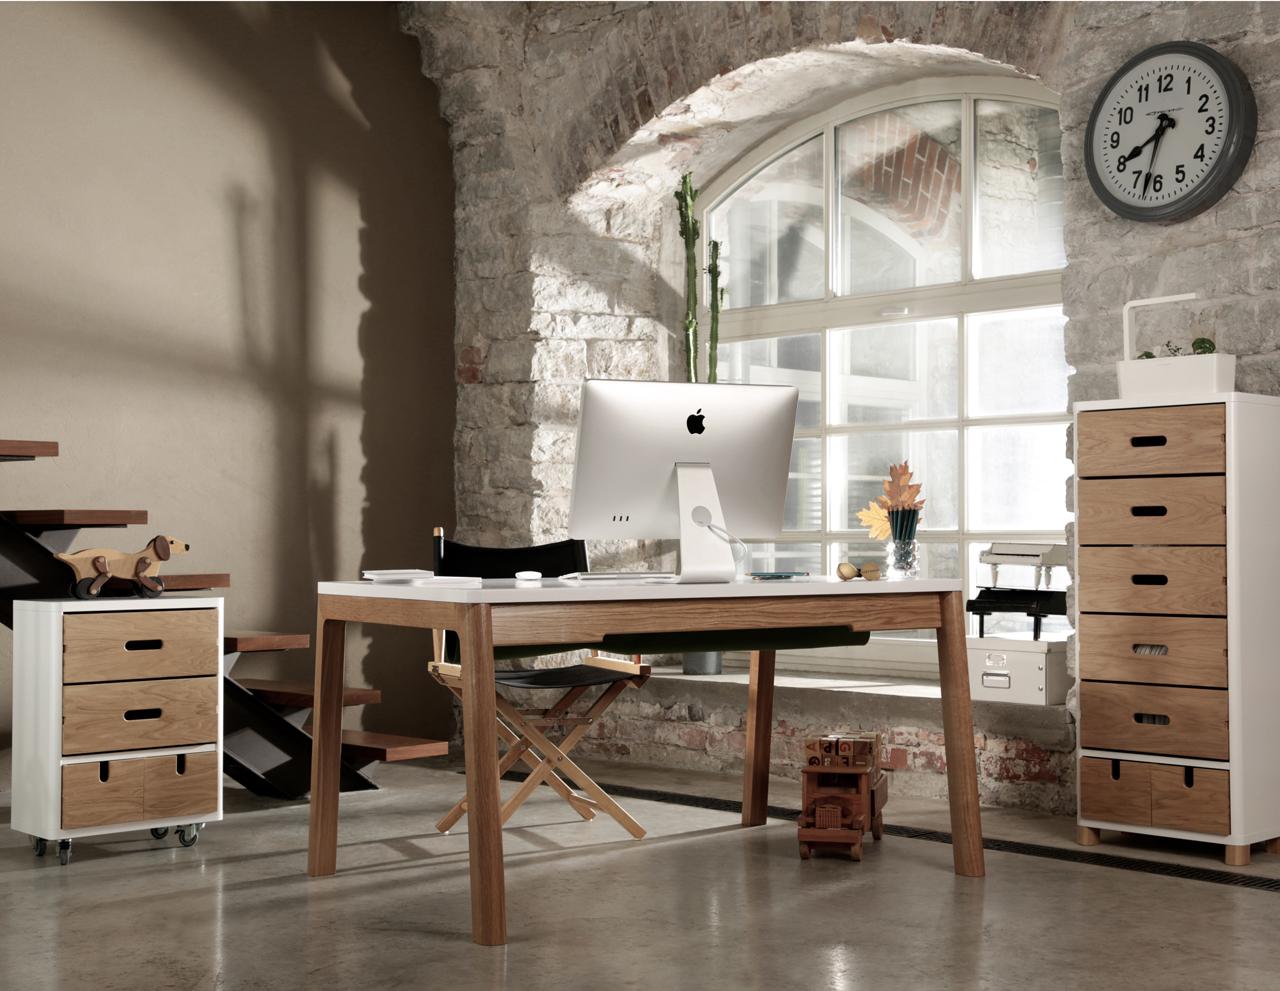 massivholzm bel f r designliebhaber von cow. Black Bedroom Furniture Sets. Home Design Ideas